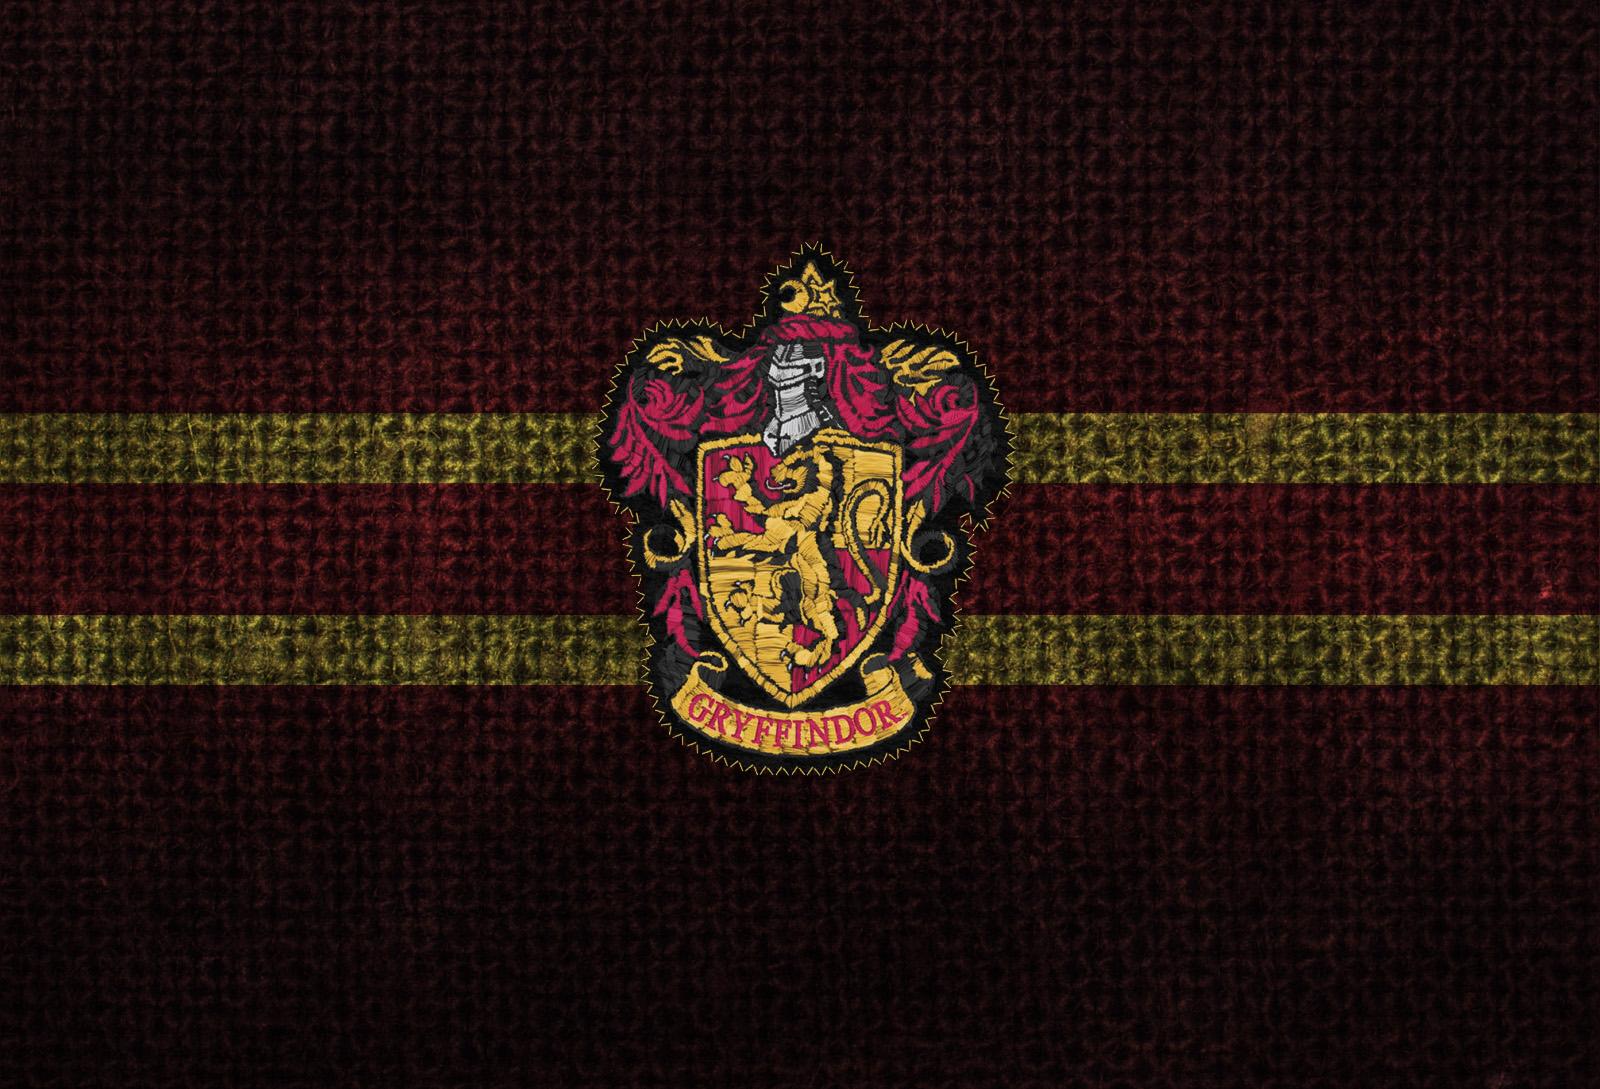 gryffindor harry potter hogwarts crest best widescreen background 1600x1089